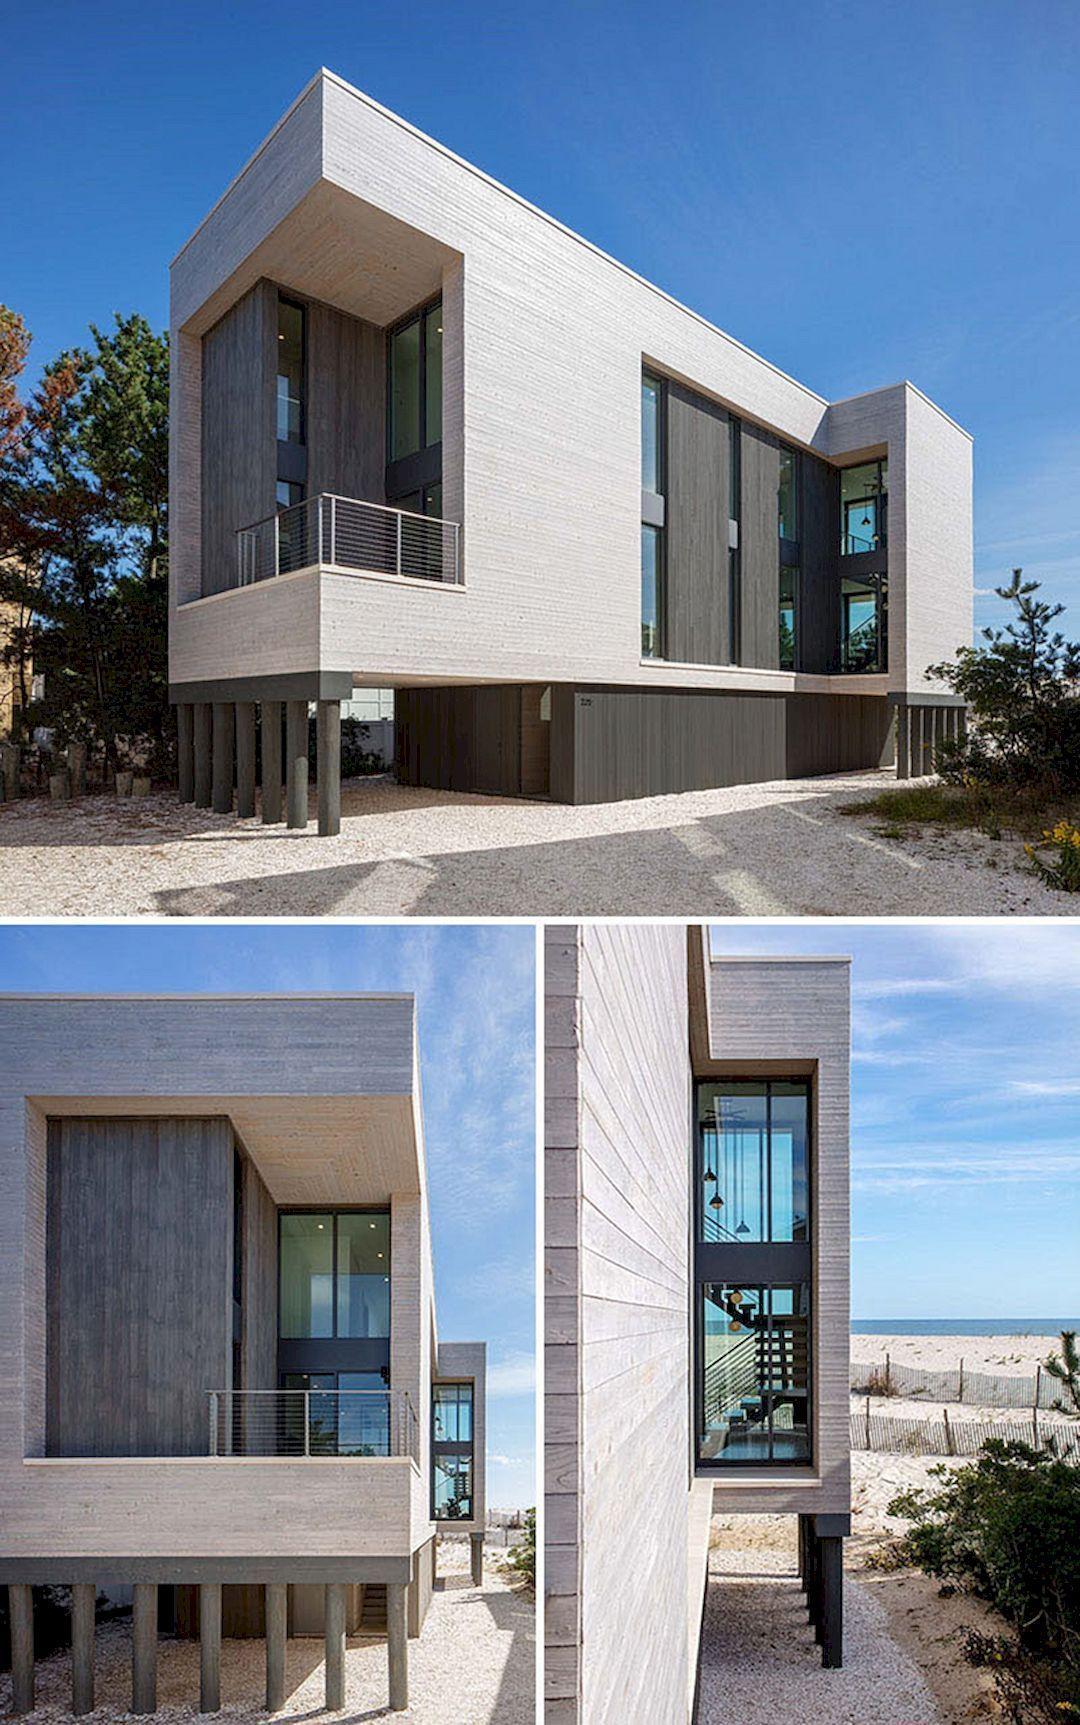 Minimalist Beach House: How To Adopt A Modern Minimalist House Design With 5